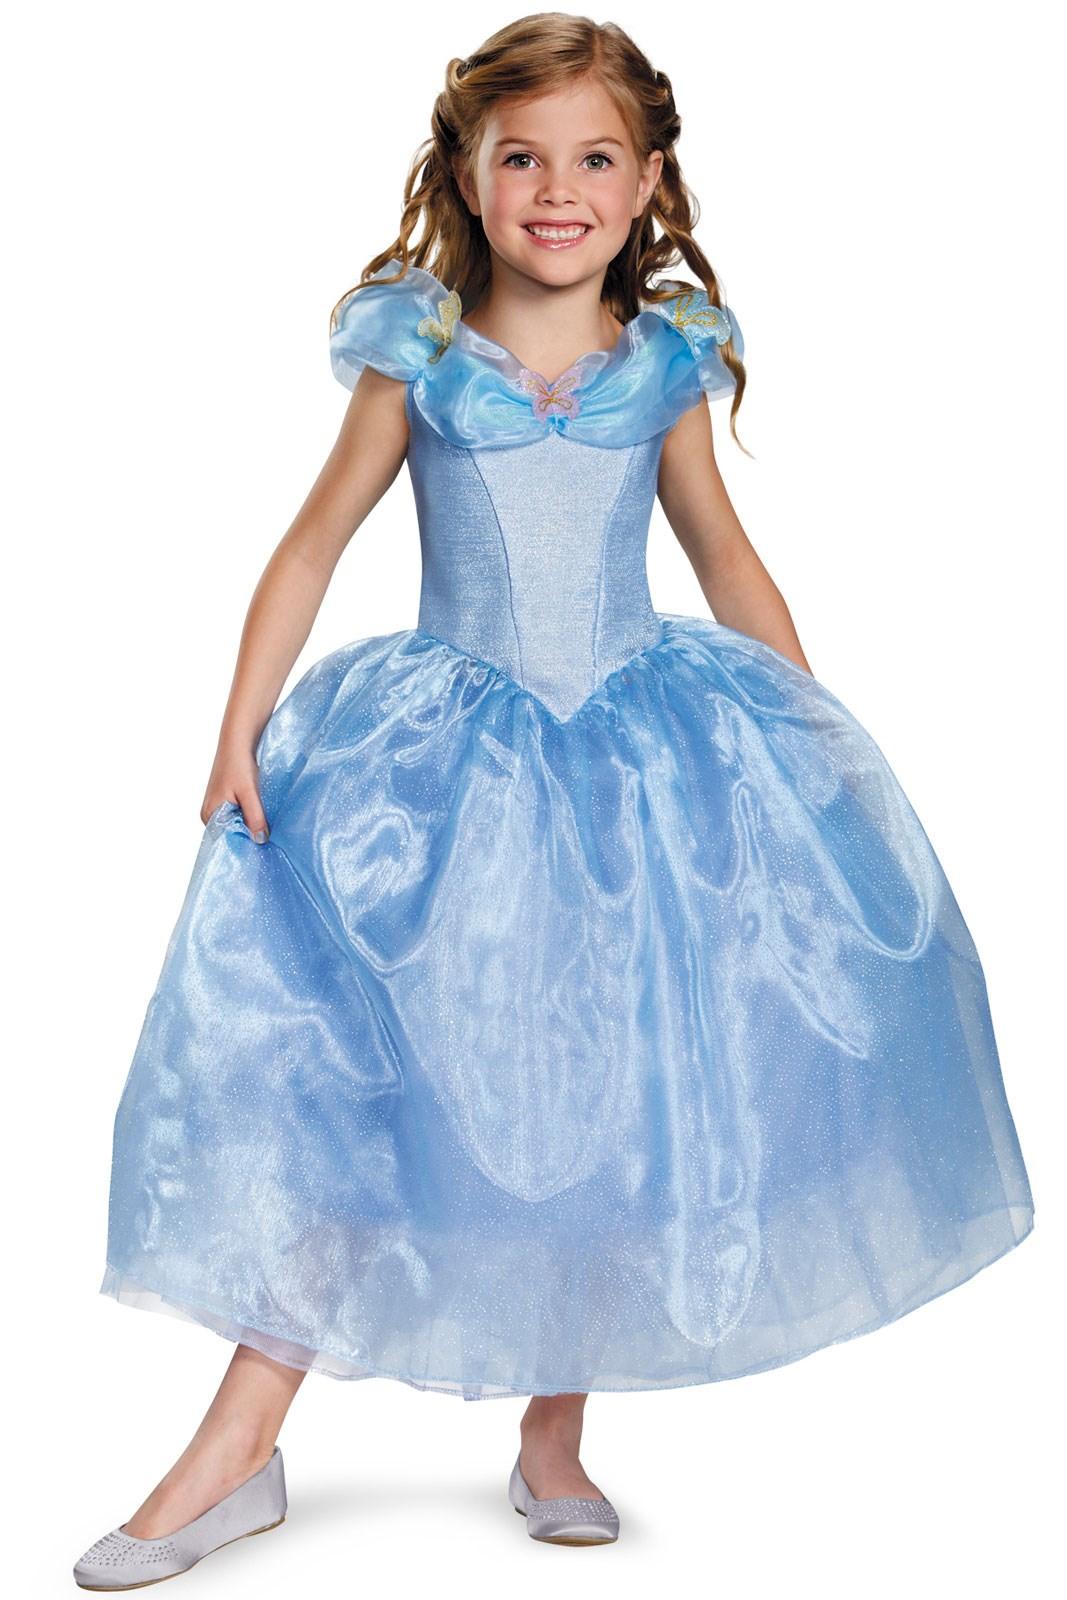 Best Cinderella Costume for Kids